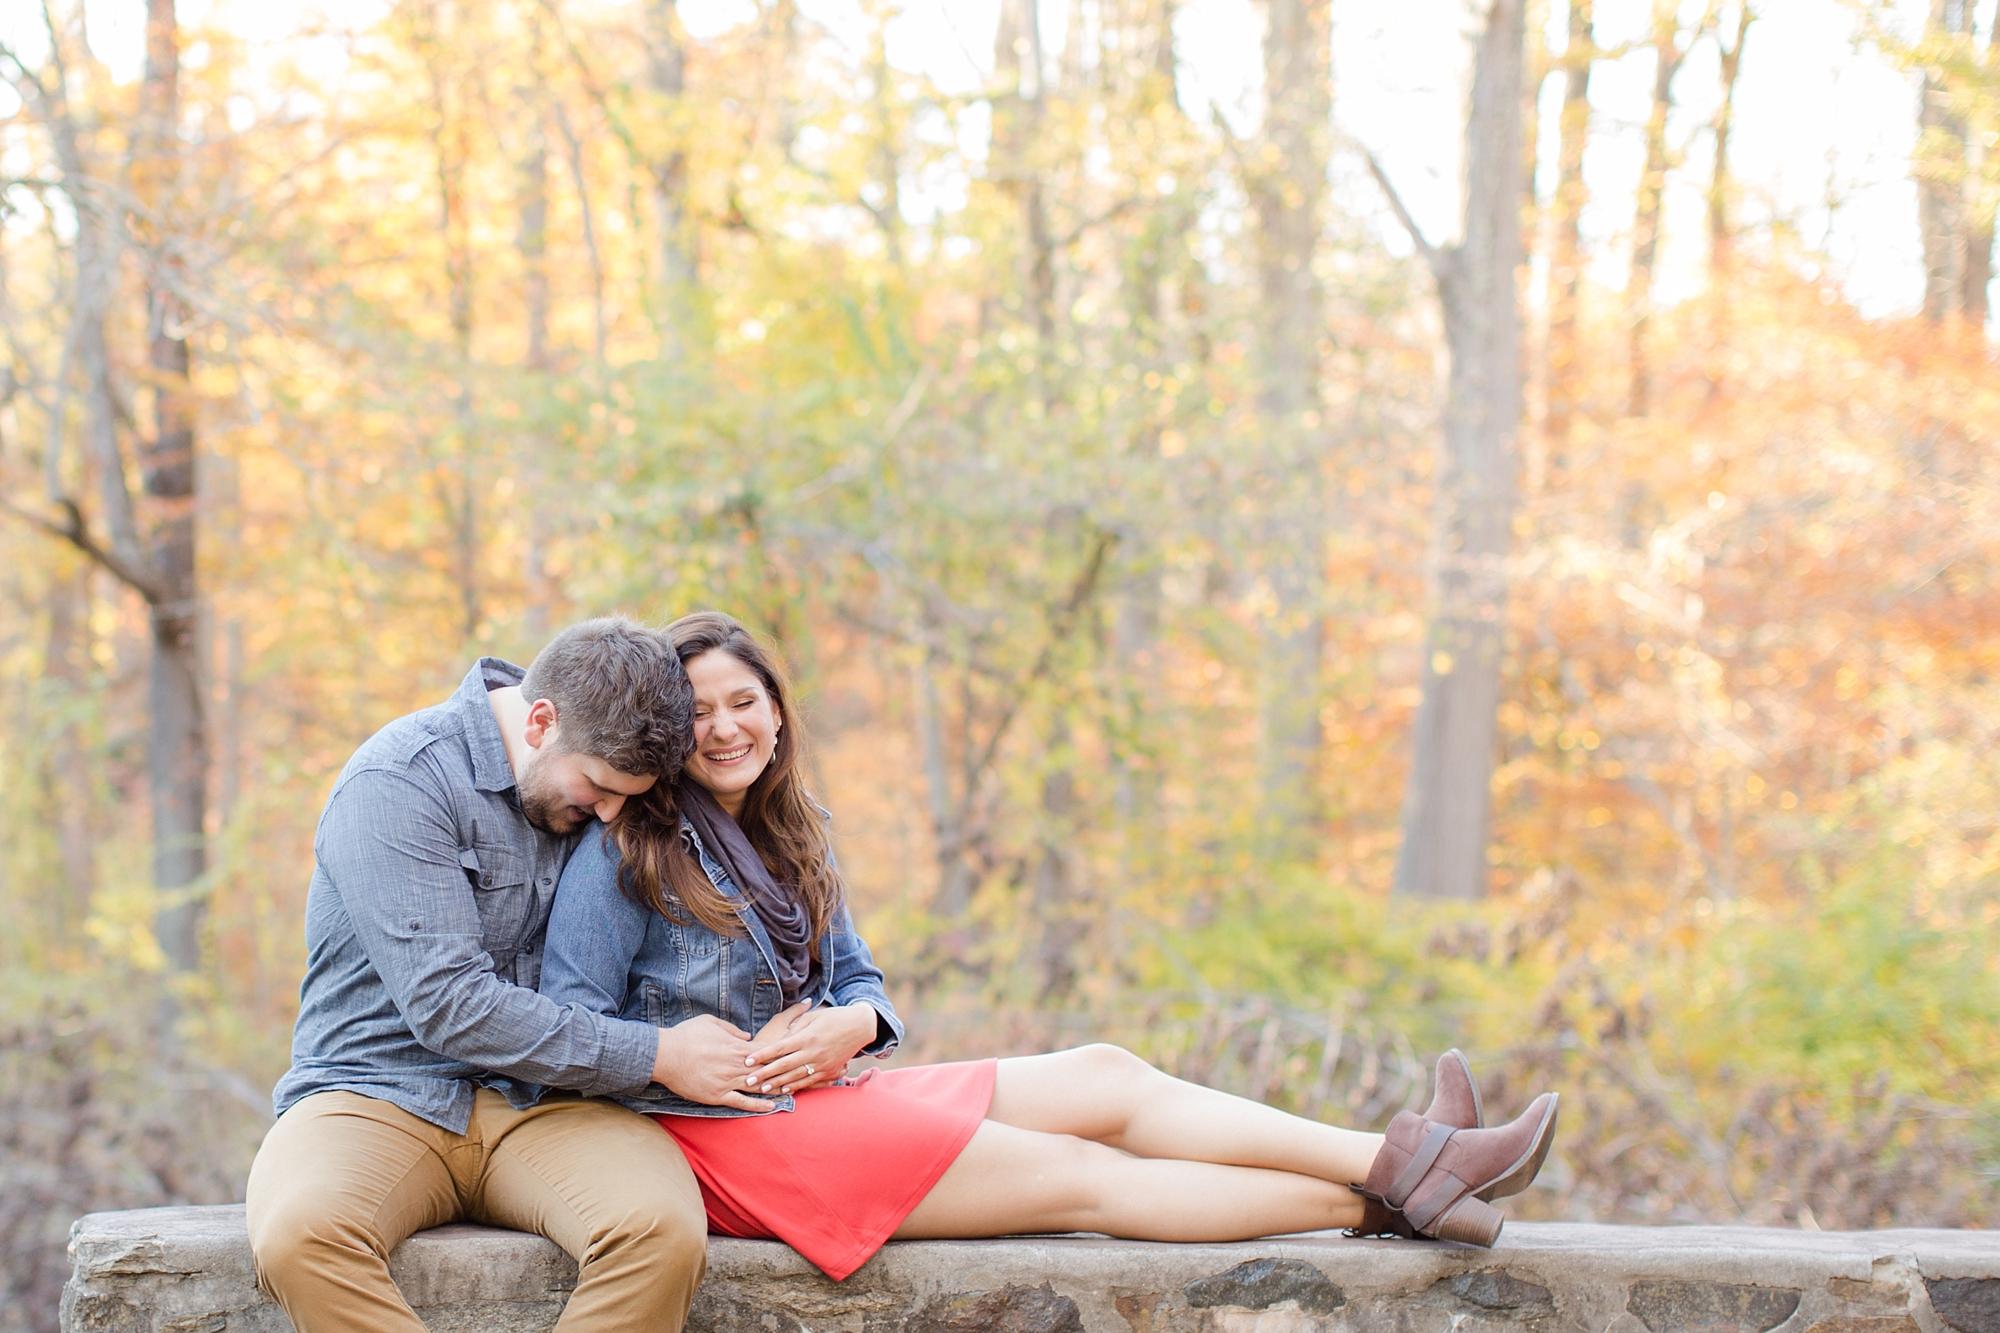 Rebecca & Greg Engagement-56_anna grace photography baltimore maryland engagement photographer jerusalem mill engagementphoto.jpg